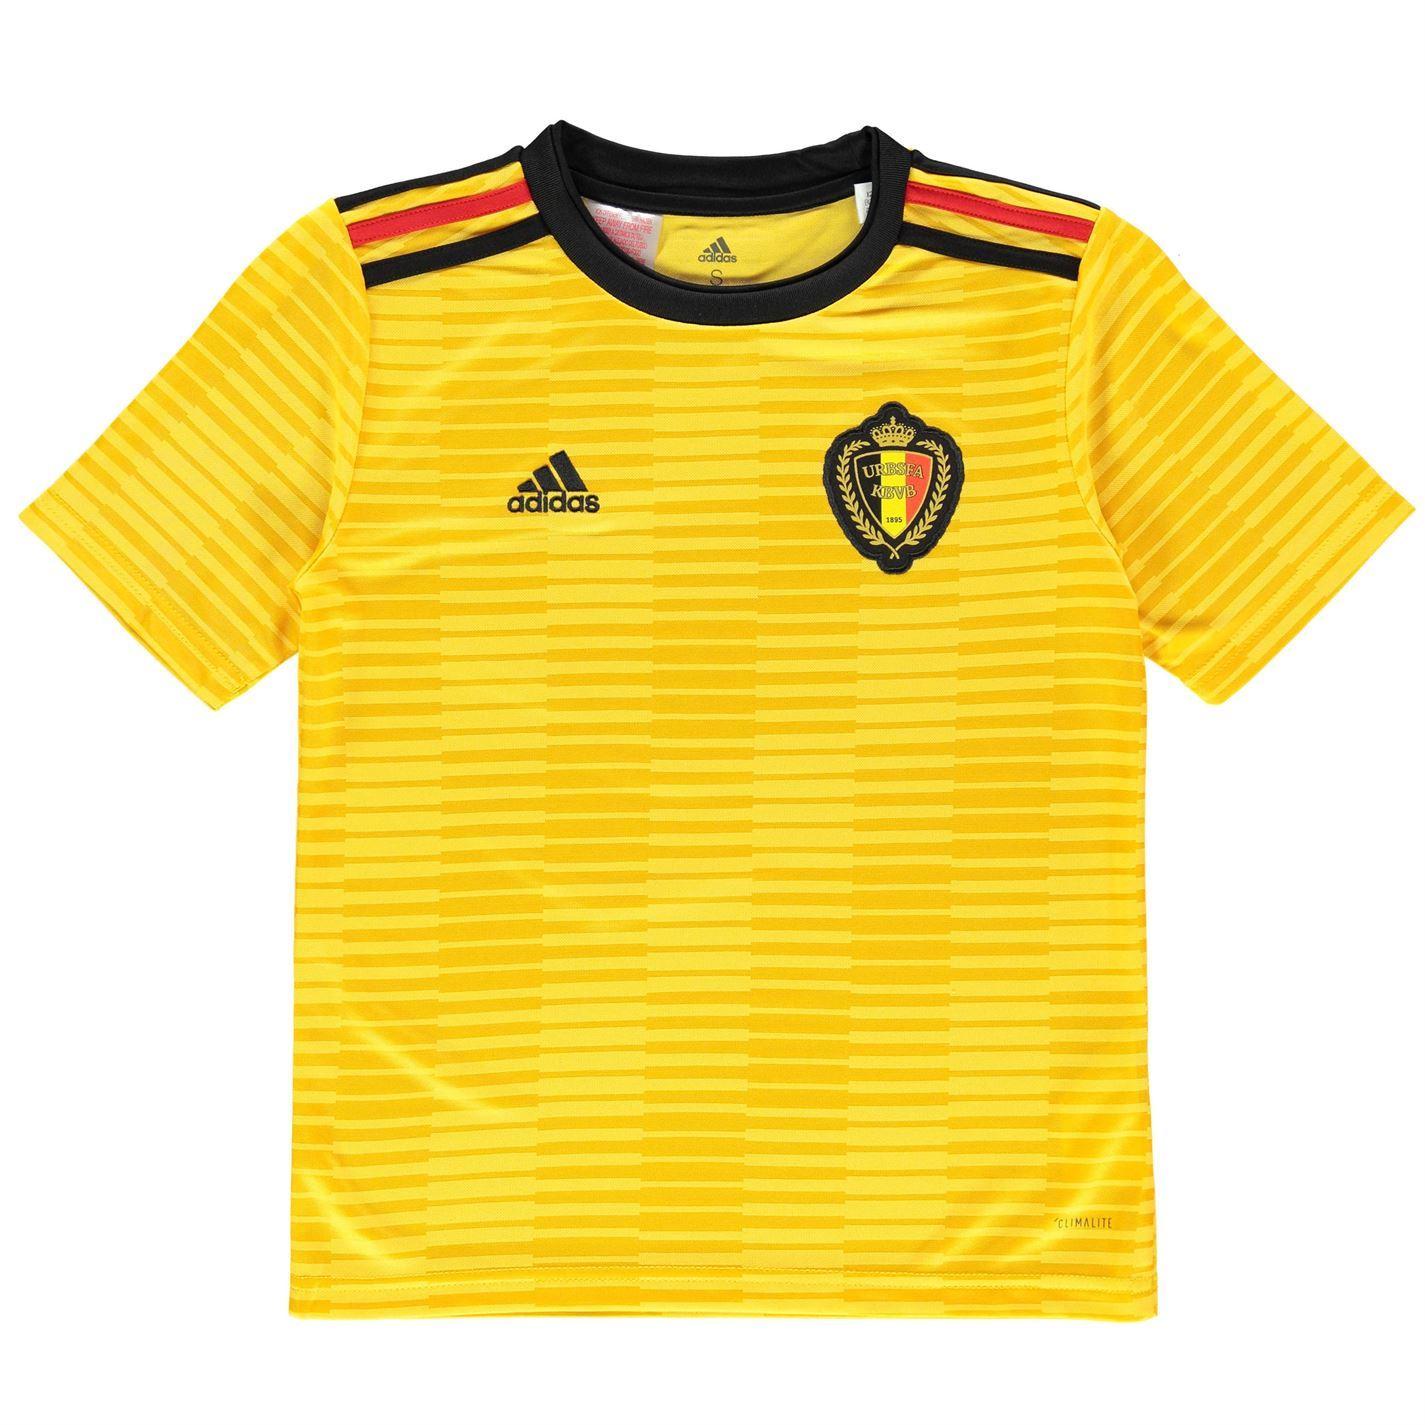 ... Adidas Bélgica a 2018 Juniors oro negro rojo fútbol fútbol camisa de  Jersey ... 79c5c937ba4d2